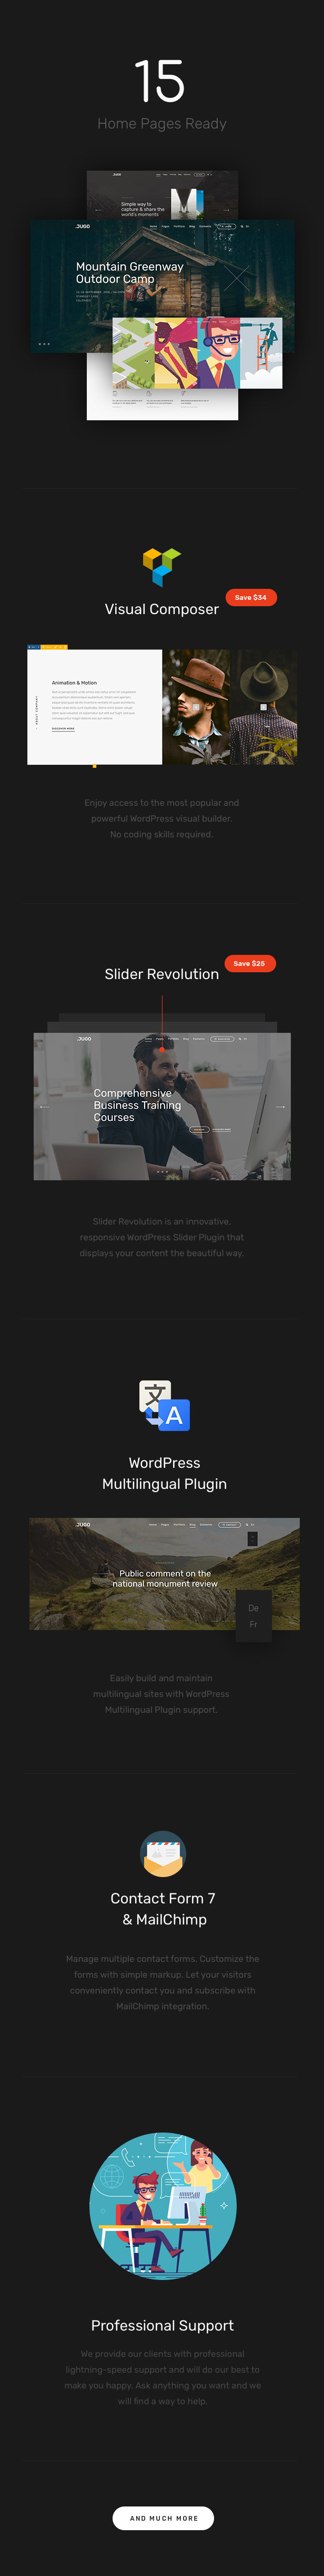 jugo-wp-features Jugo — Responsive Multipurpose WordPress Theme theme WordPress